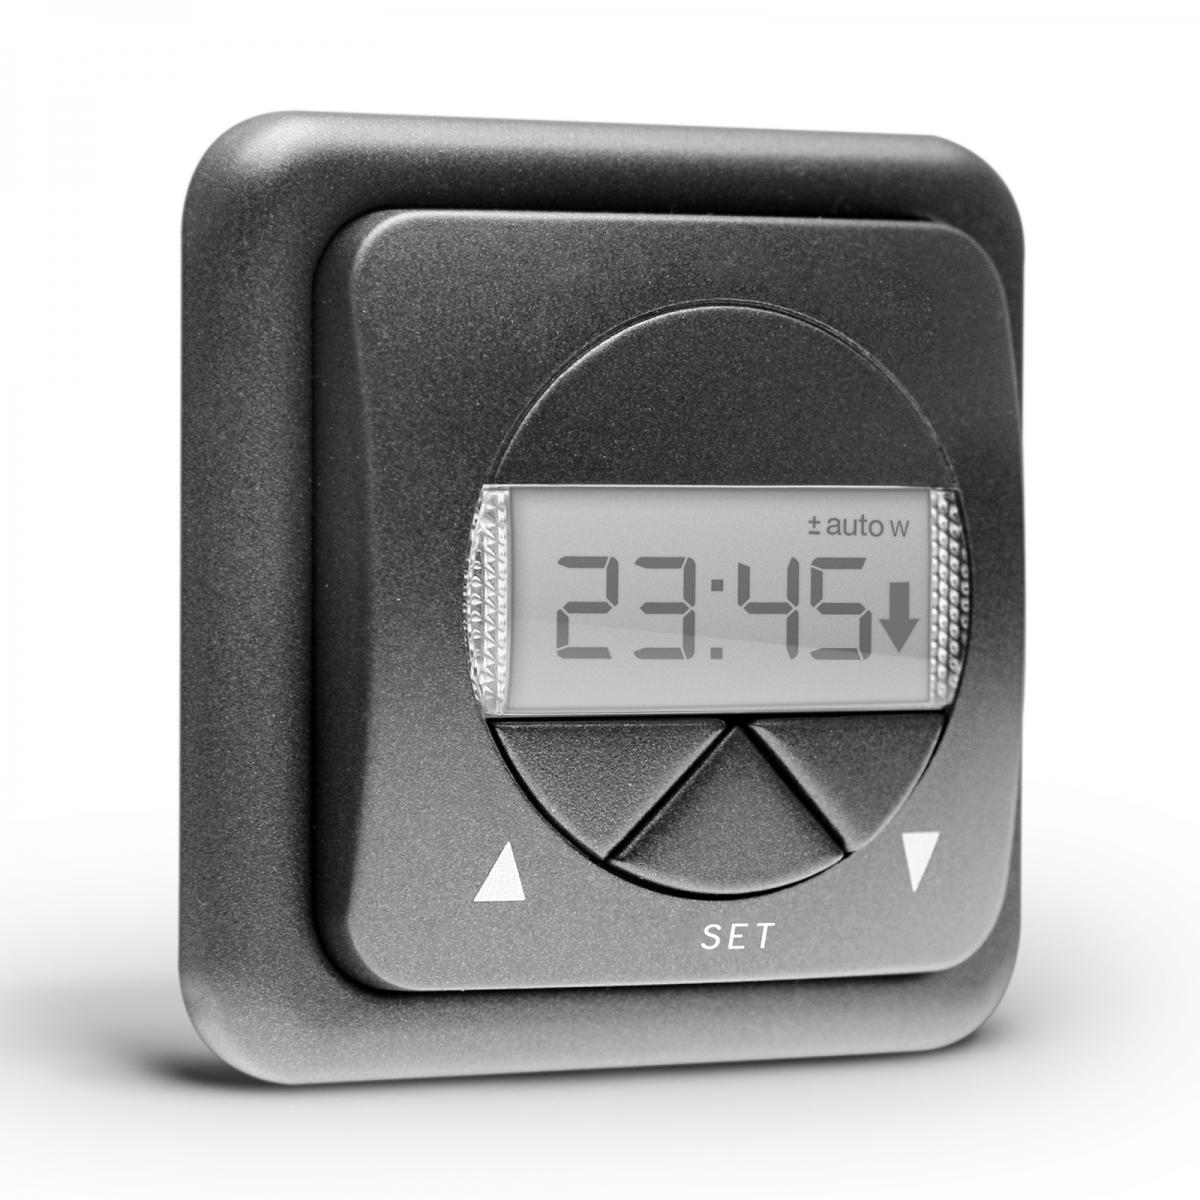 rolladen zeitschaltuhr steuerung f r rolladenmotor rohrmotor timer uhr nobily em ebay. Black Bedroom Furniture Sets. Home Design Ideas